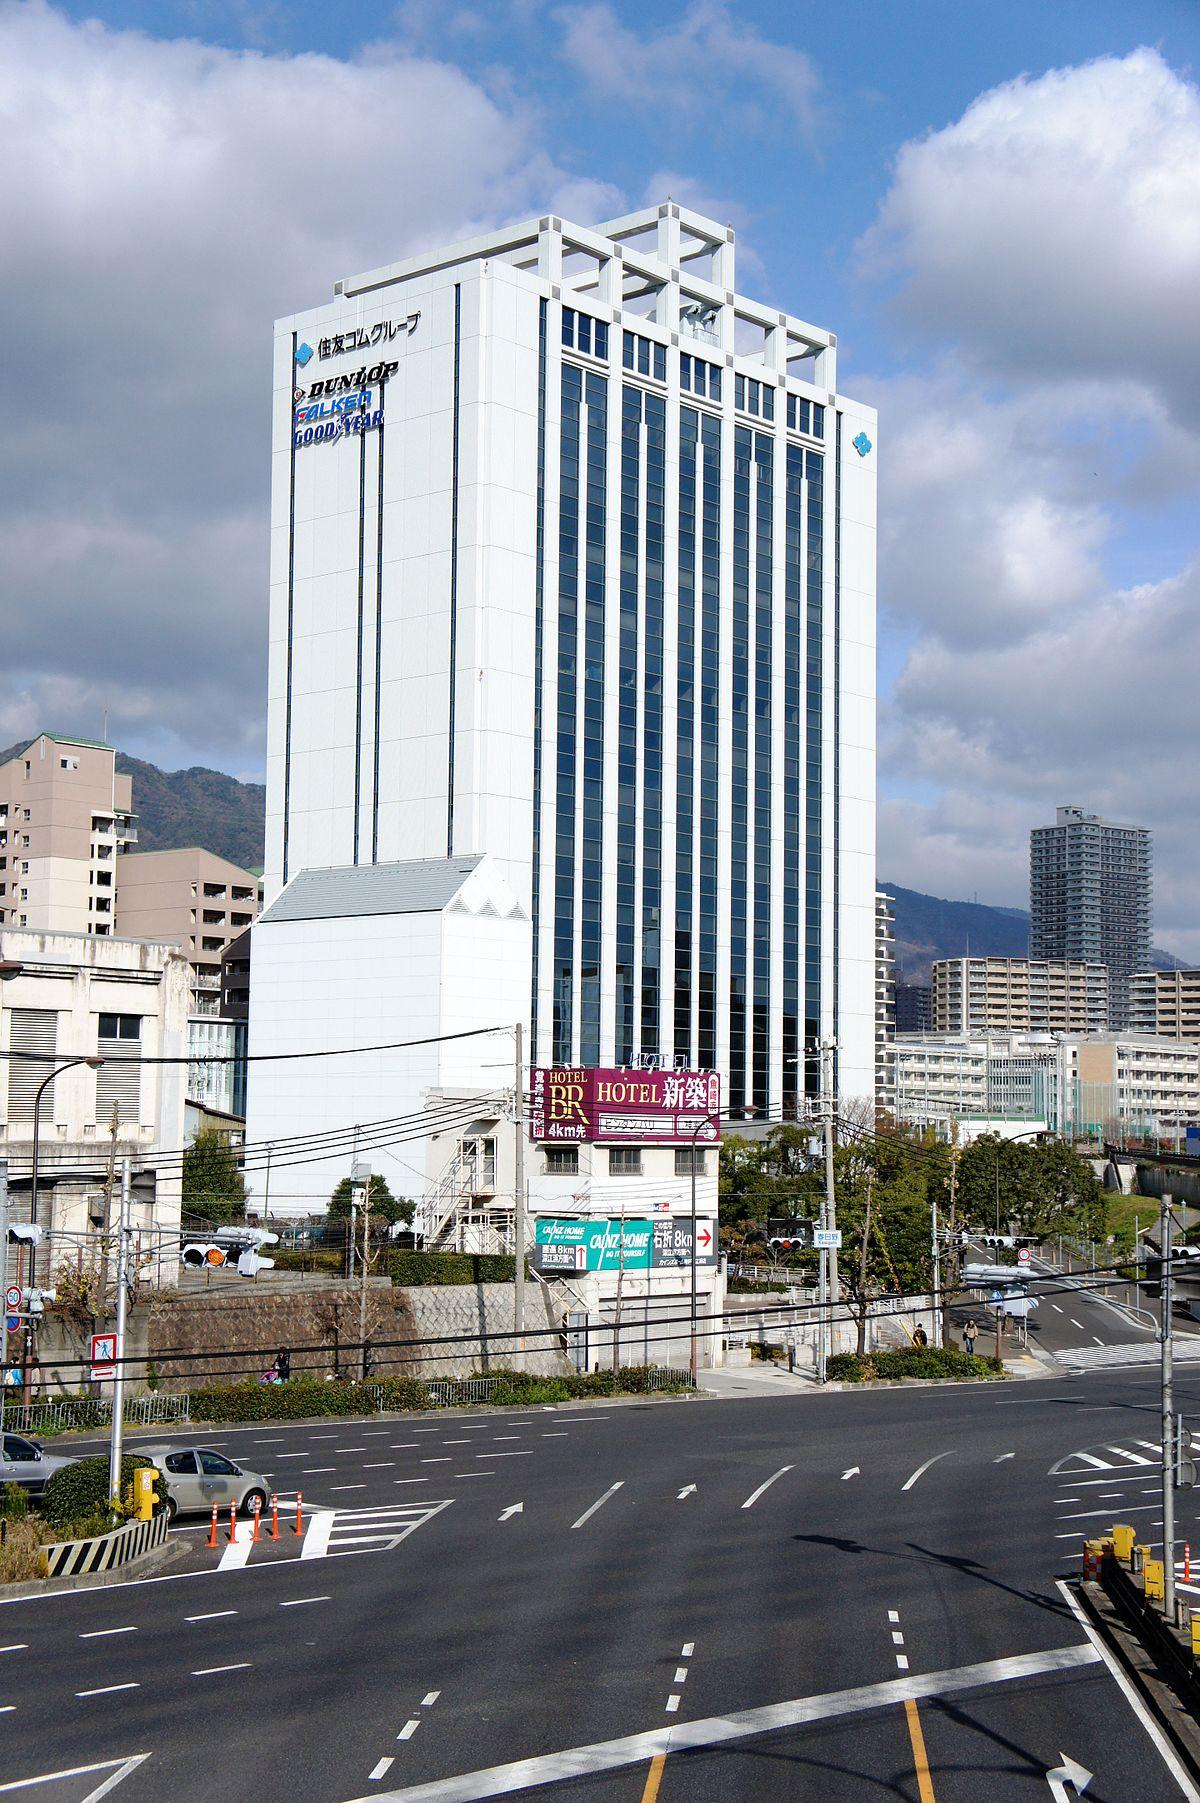 脇浜町 Wikipedia